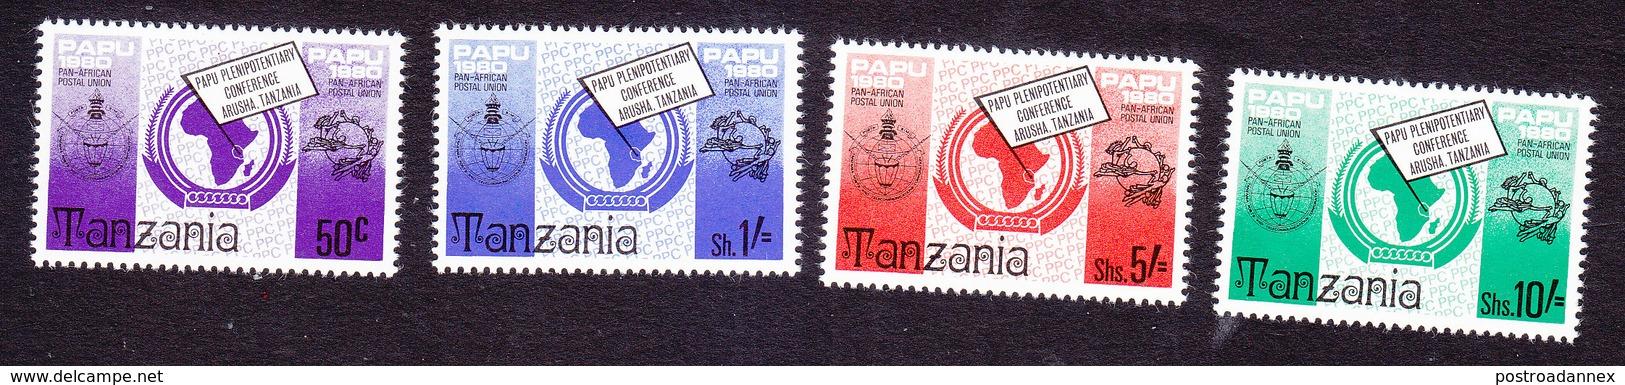 Tanzania, Scott #153-156, Mint Hinged, Pan African Postal Union, Issued 1980 - Tanzania (1964-...)